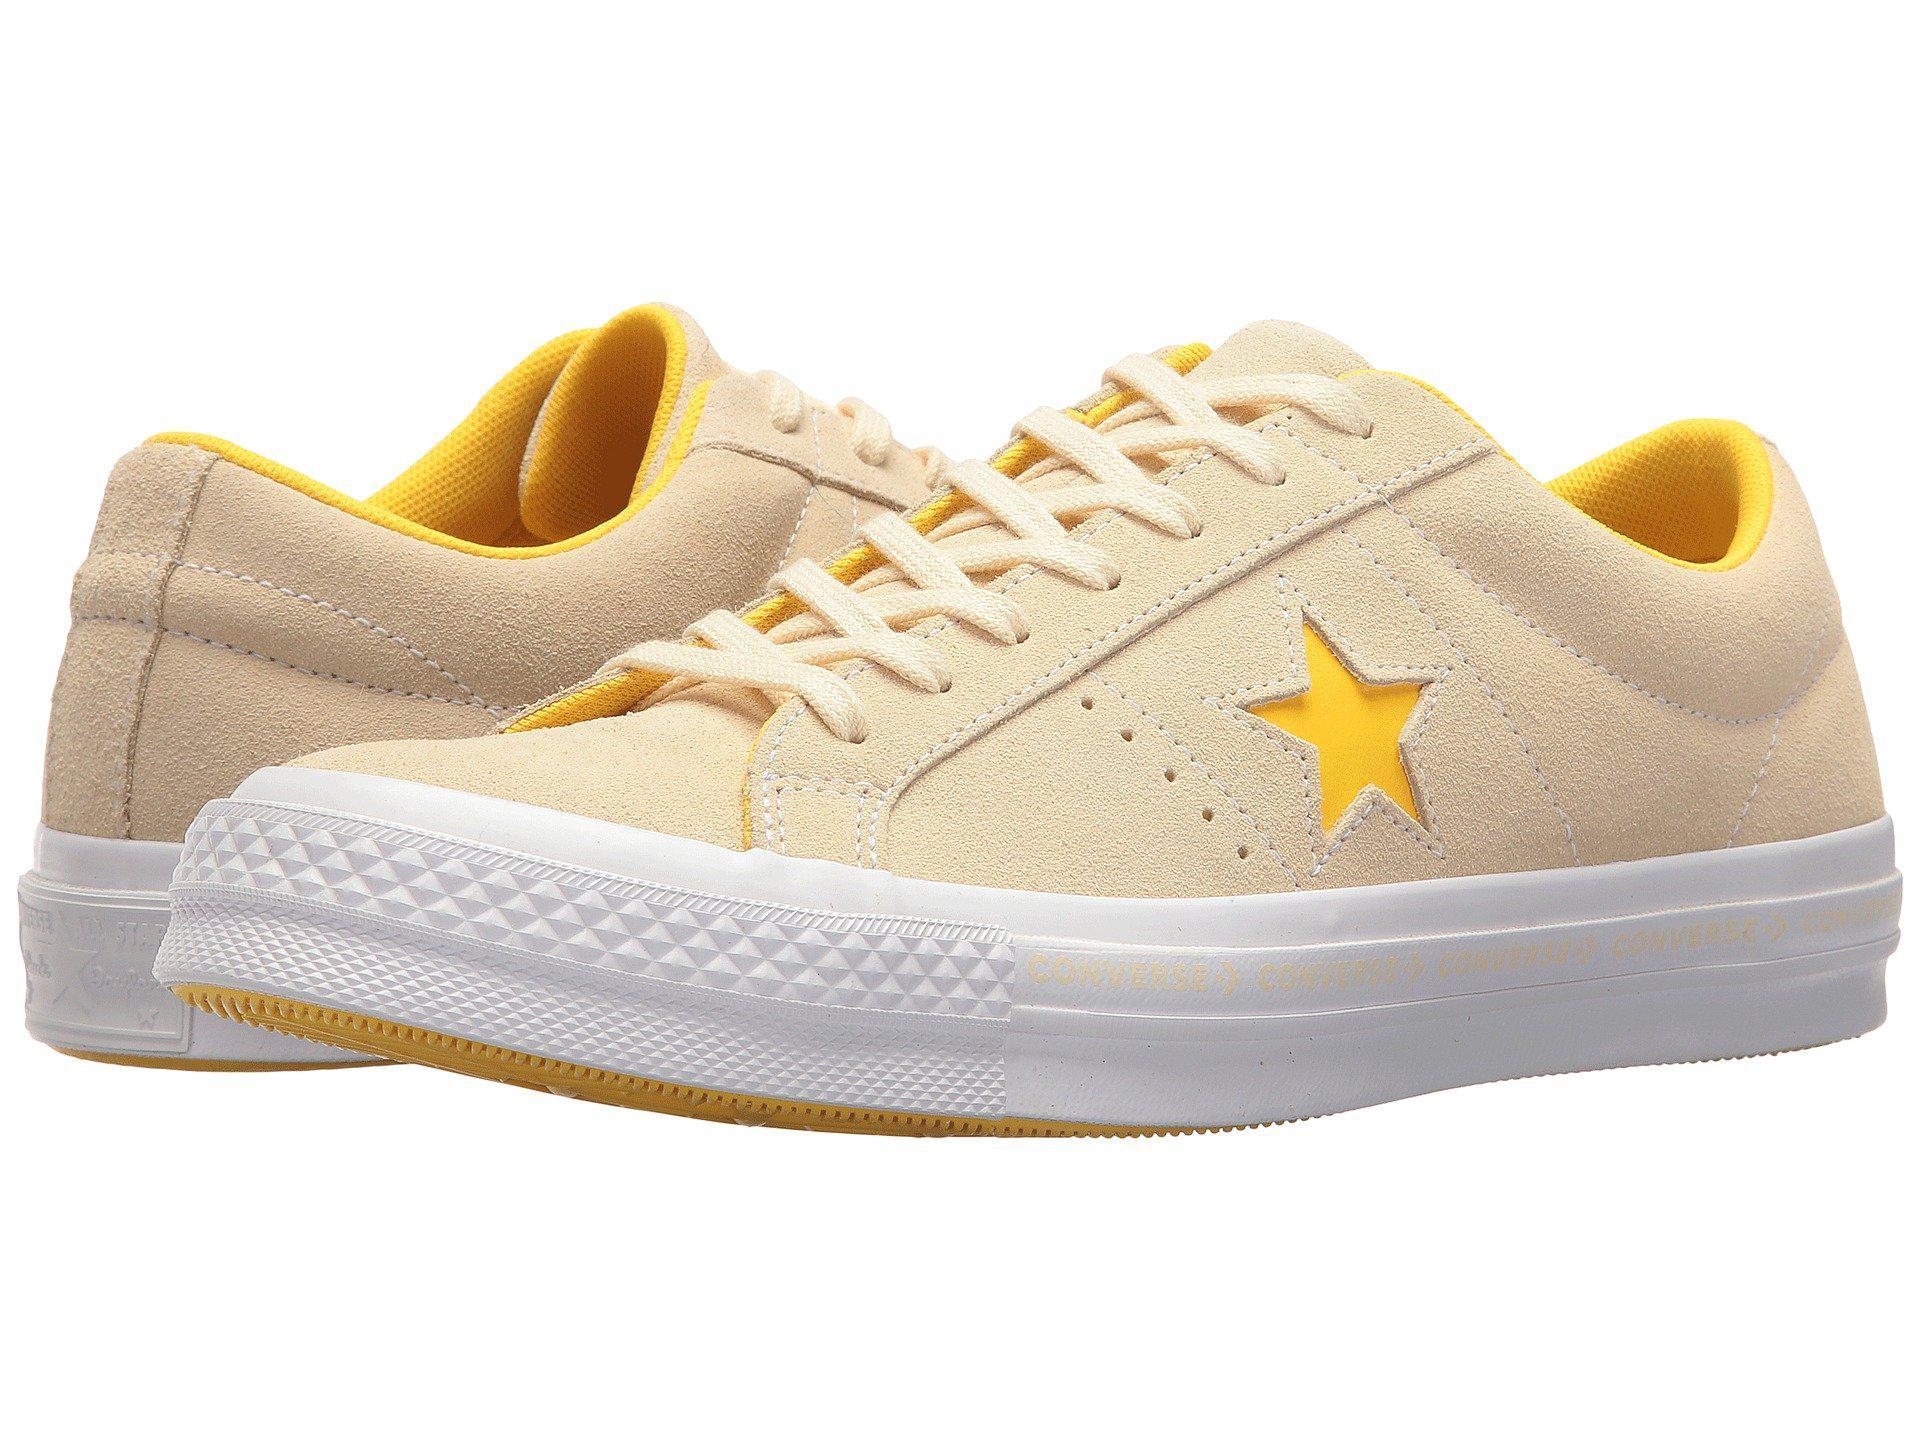 Converse ONE STAR - OX PINESTRIPE - Trainers - vanilla/solar power/white 8JvDy0vL